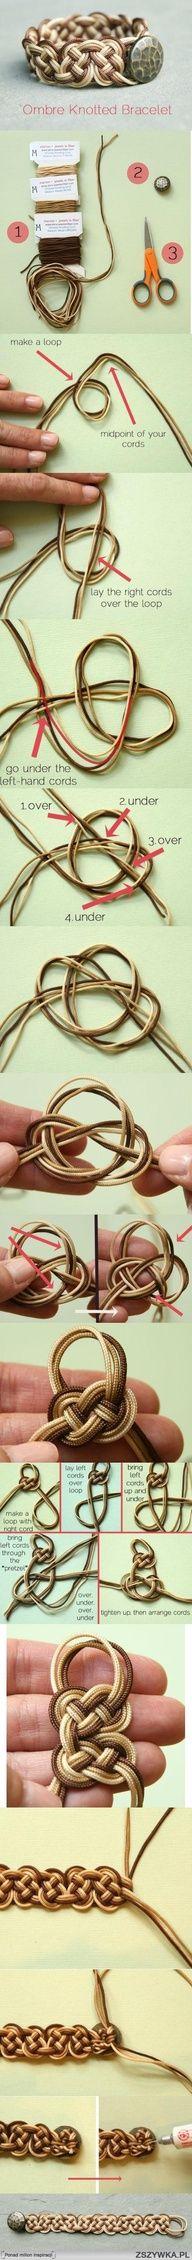 Ombre Celtic Knot Bracelet #jewelry #tutorial